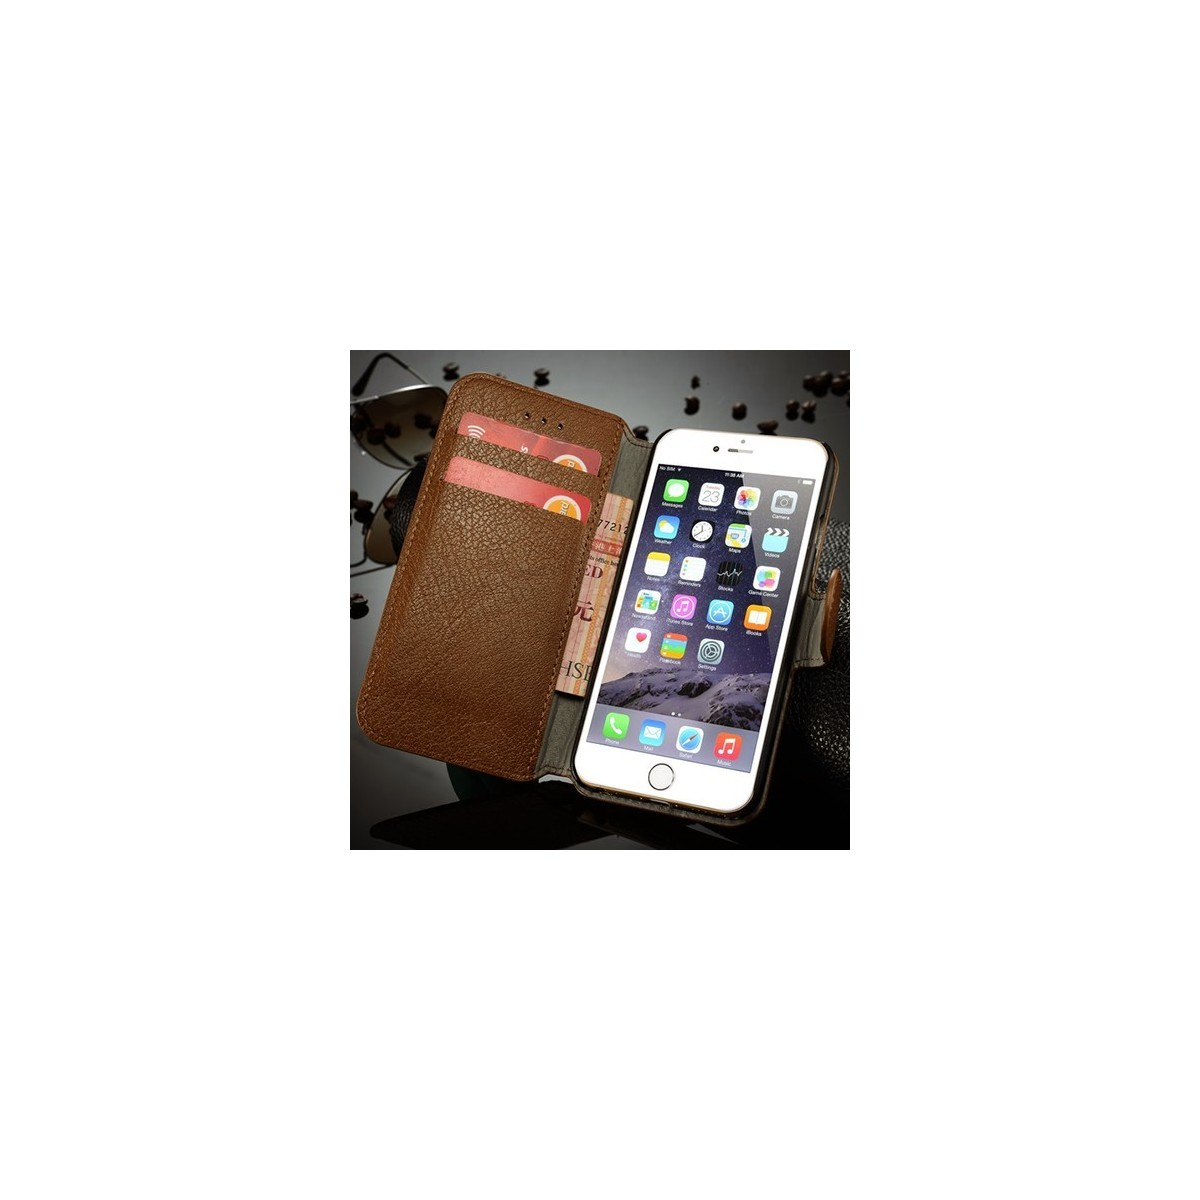 Etui Book type bleu nuit pour iPhone 6 Plus - CaseMe